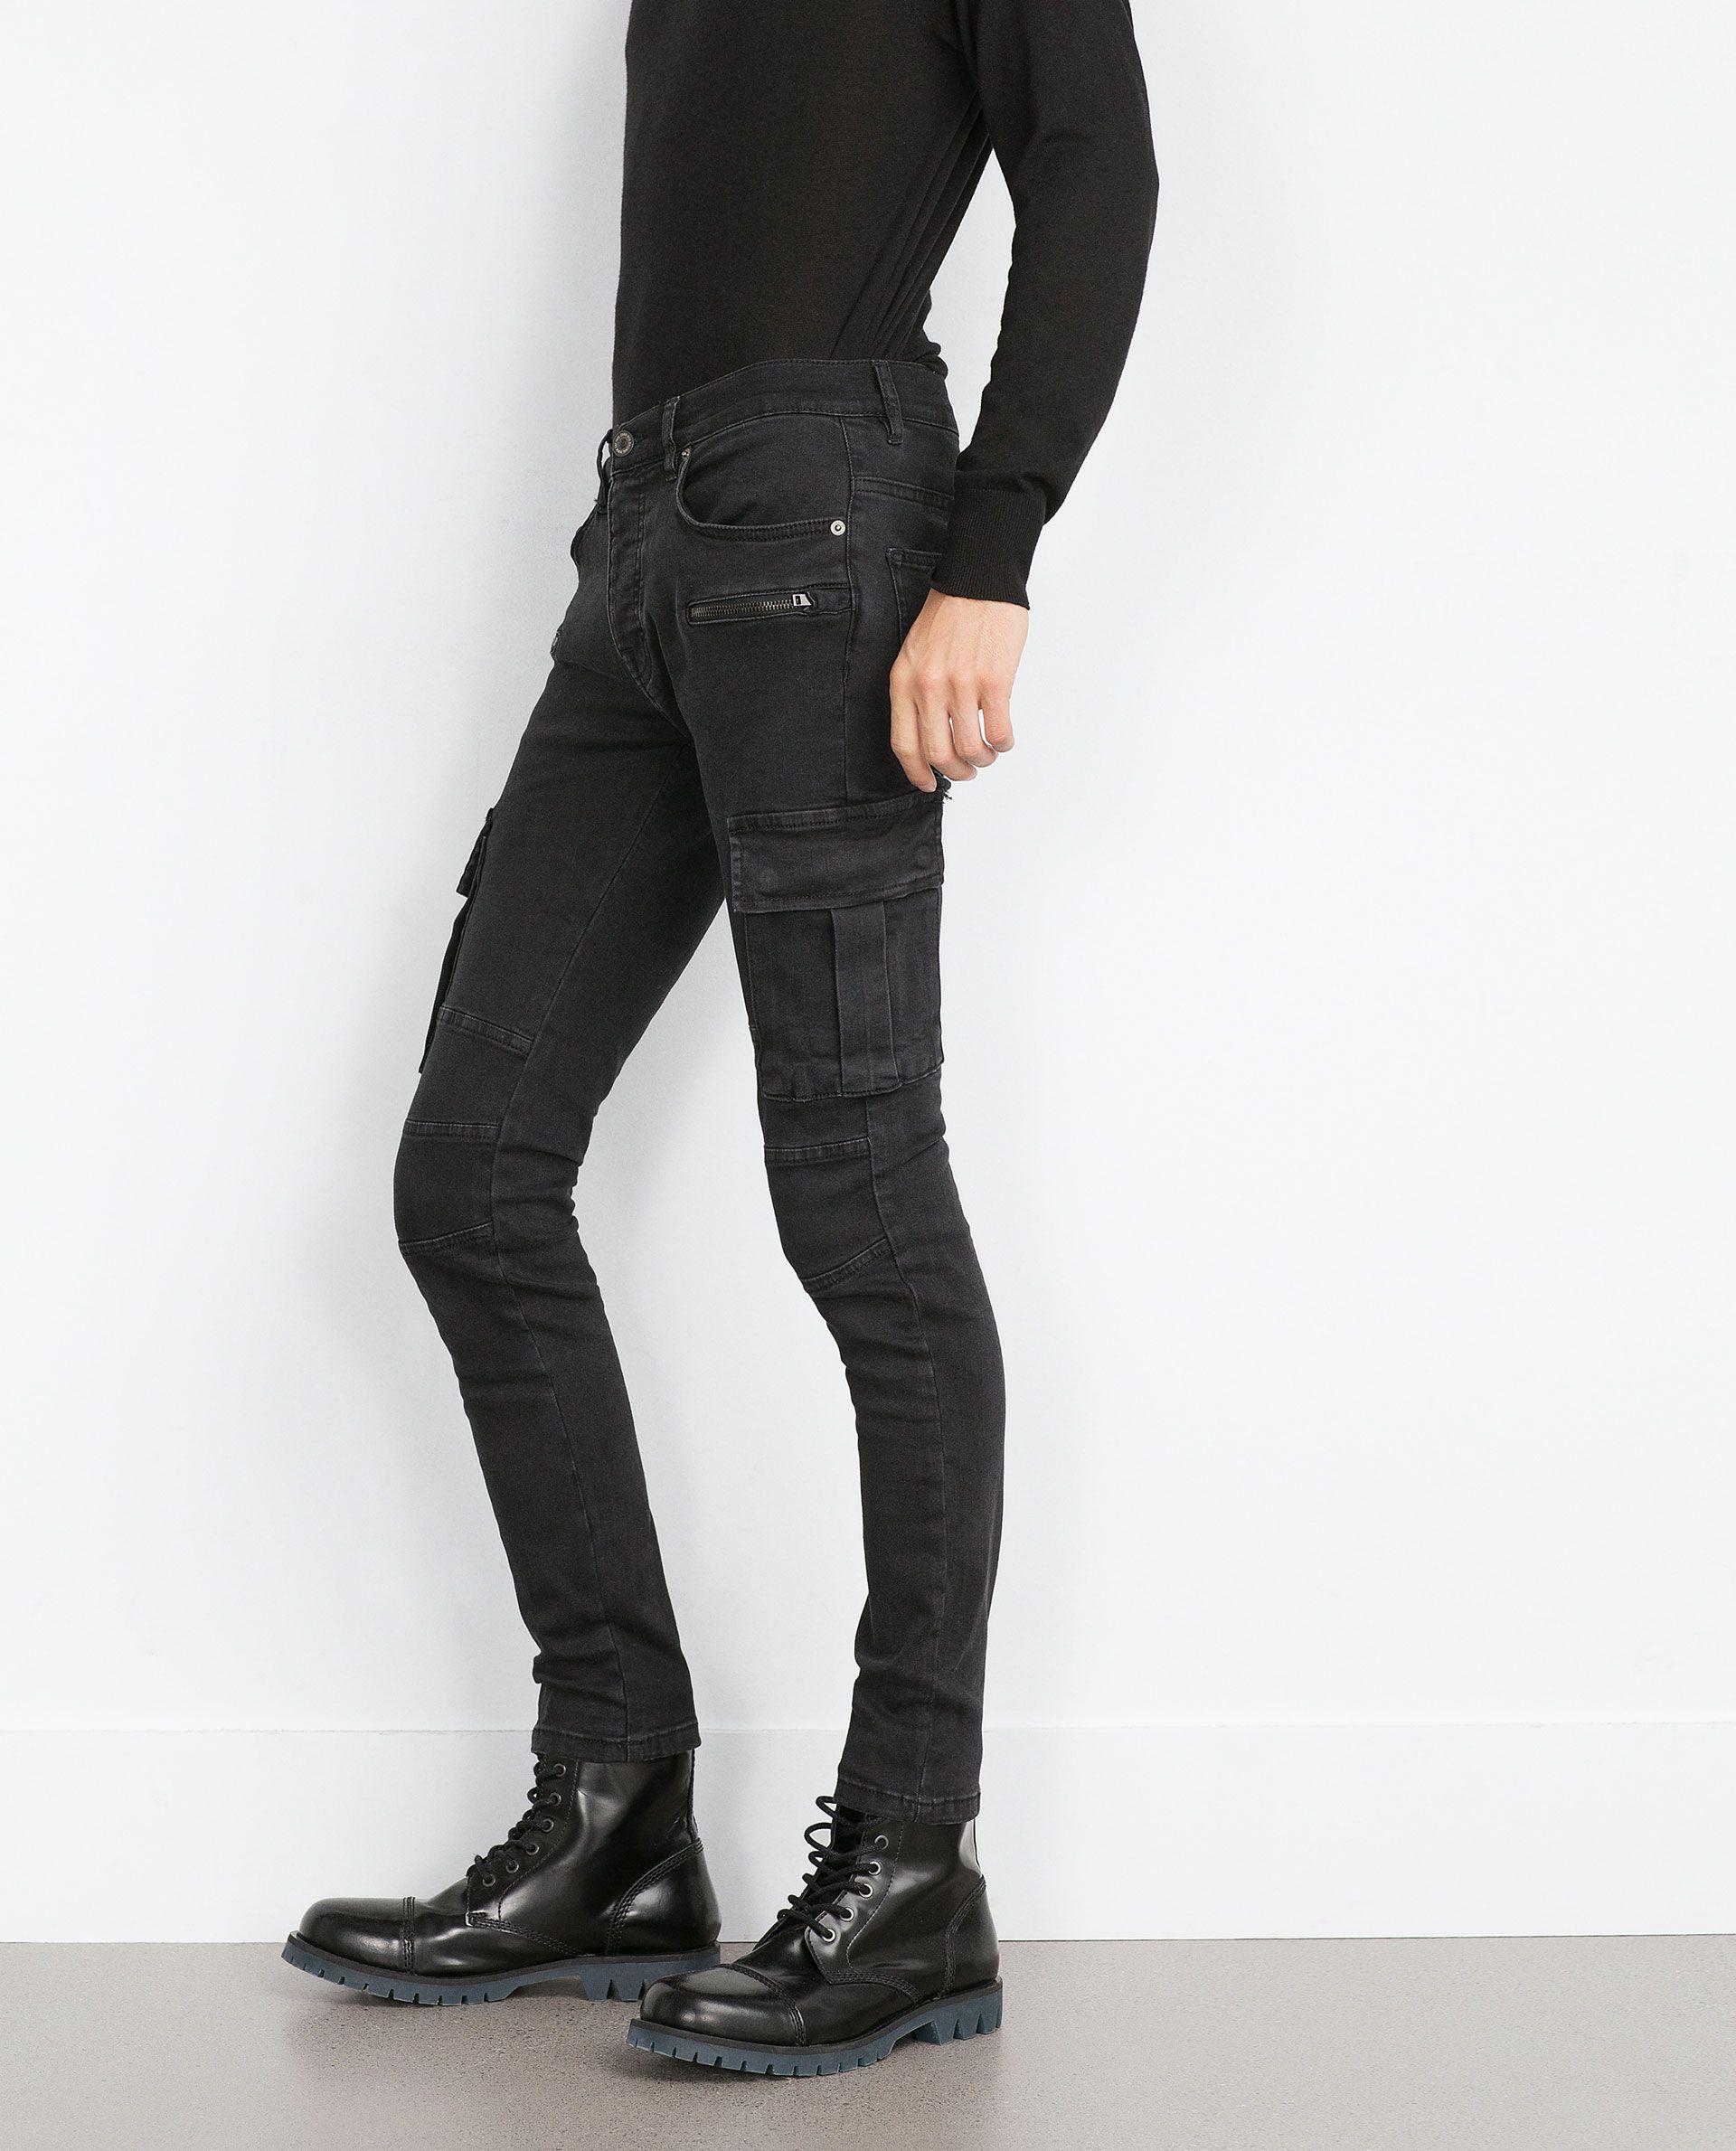 2e0e6b22 ZARA - MAN - CARGO JEANS   FASHION   Cargo jeans, Jeans, Cargo pants